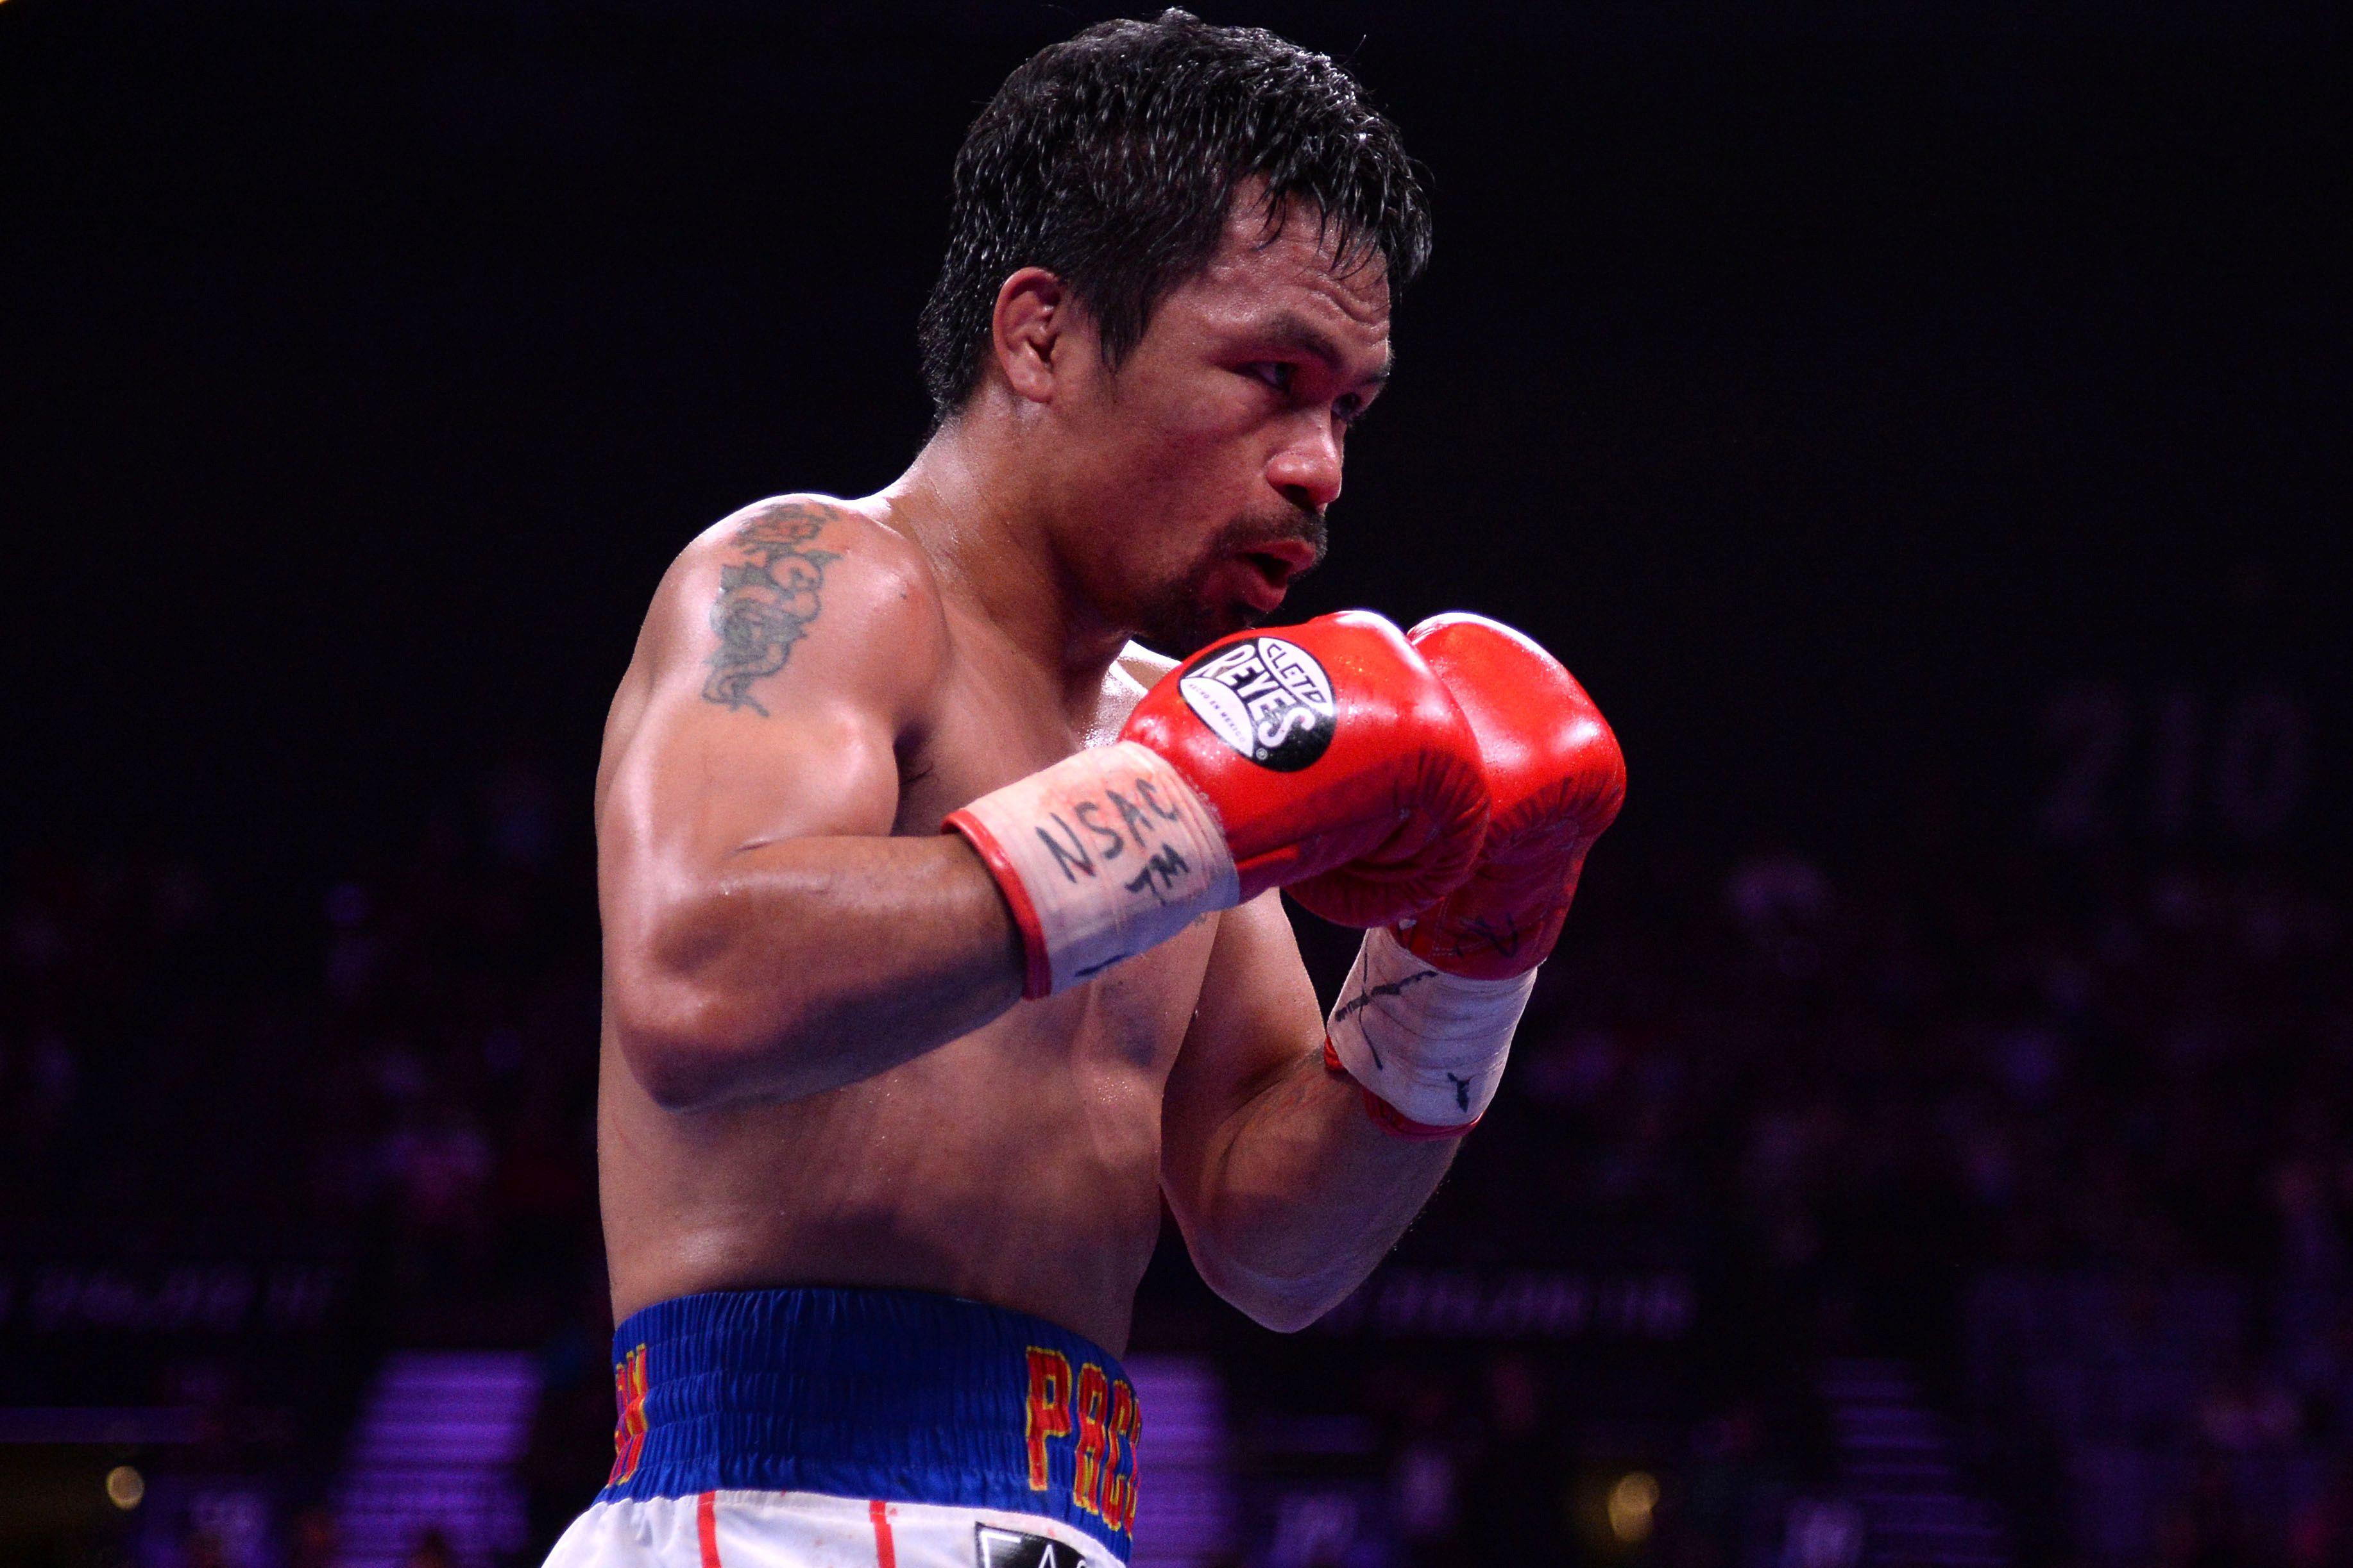 Manny Pacquiao volverá a subirse a un ring después de dos años (Joe Camporeale-USA TODAY Sports/File Photo)